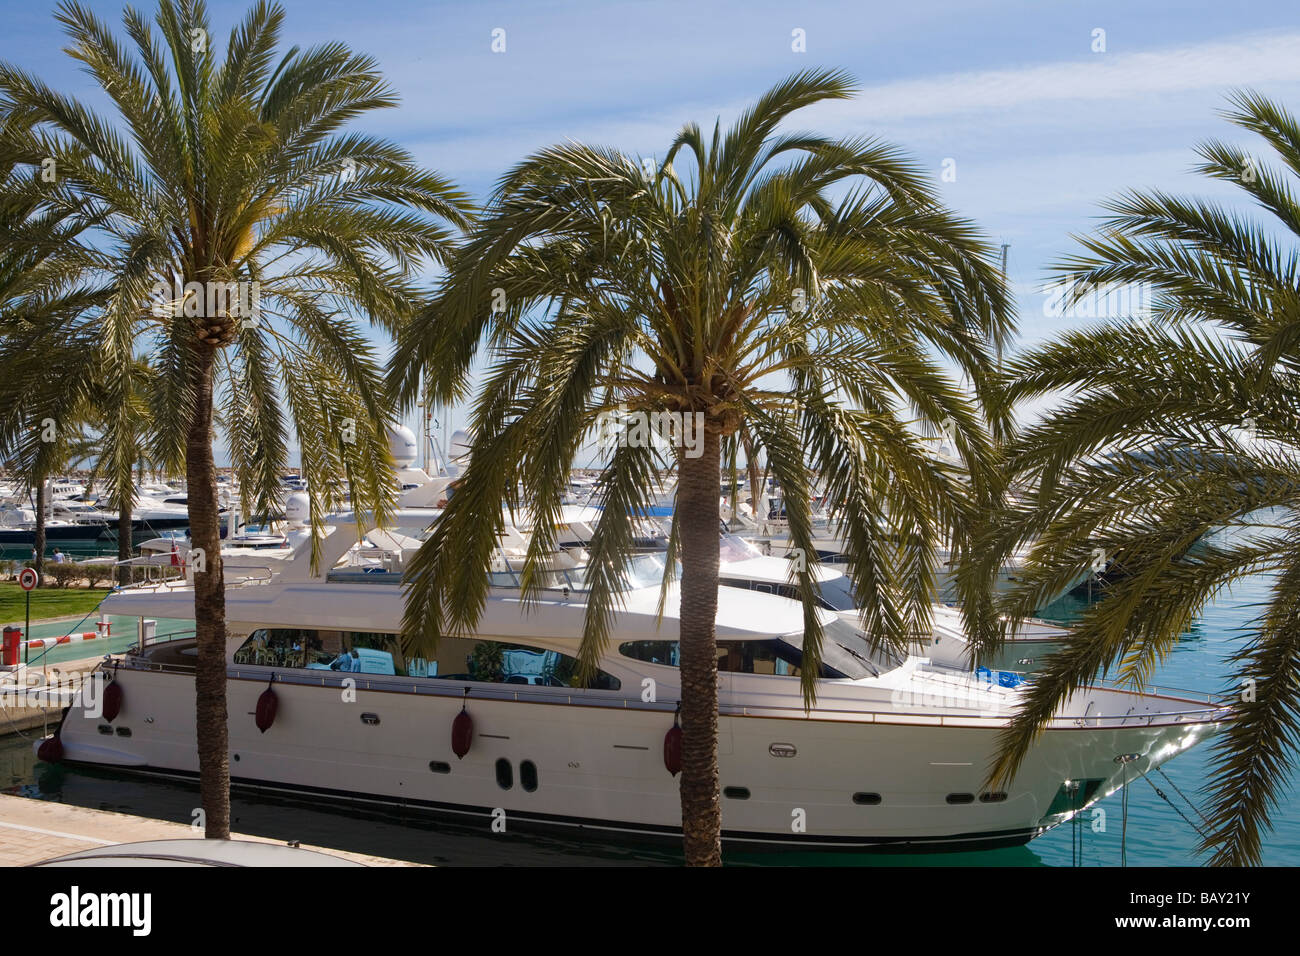 Palm Trees and Luxury Yachts in Puerto Portals Marina, Puerto Portals, Mallorca, Balearic Islands, Spain - Stock Image